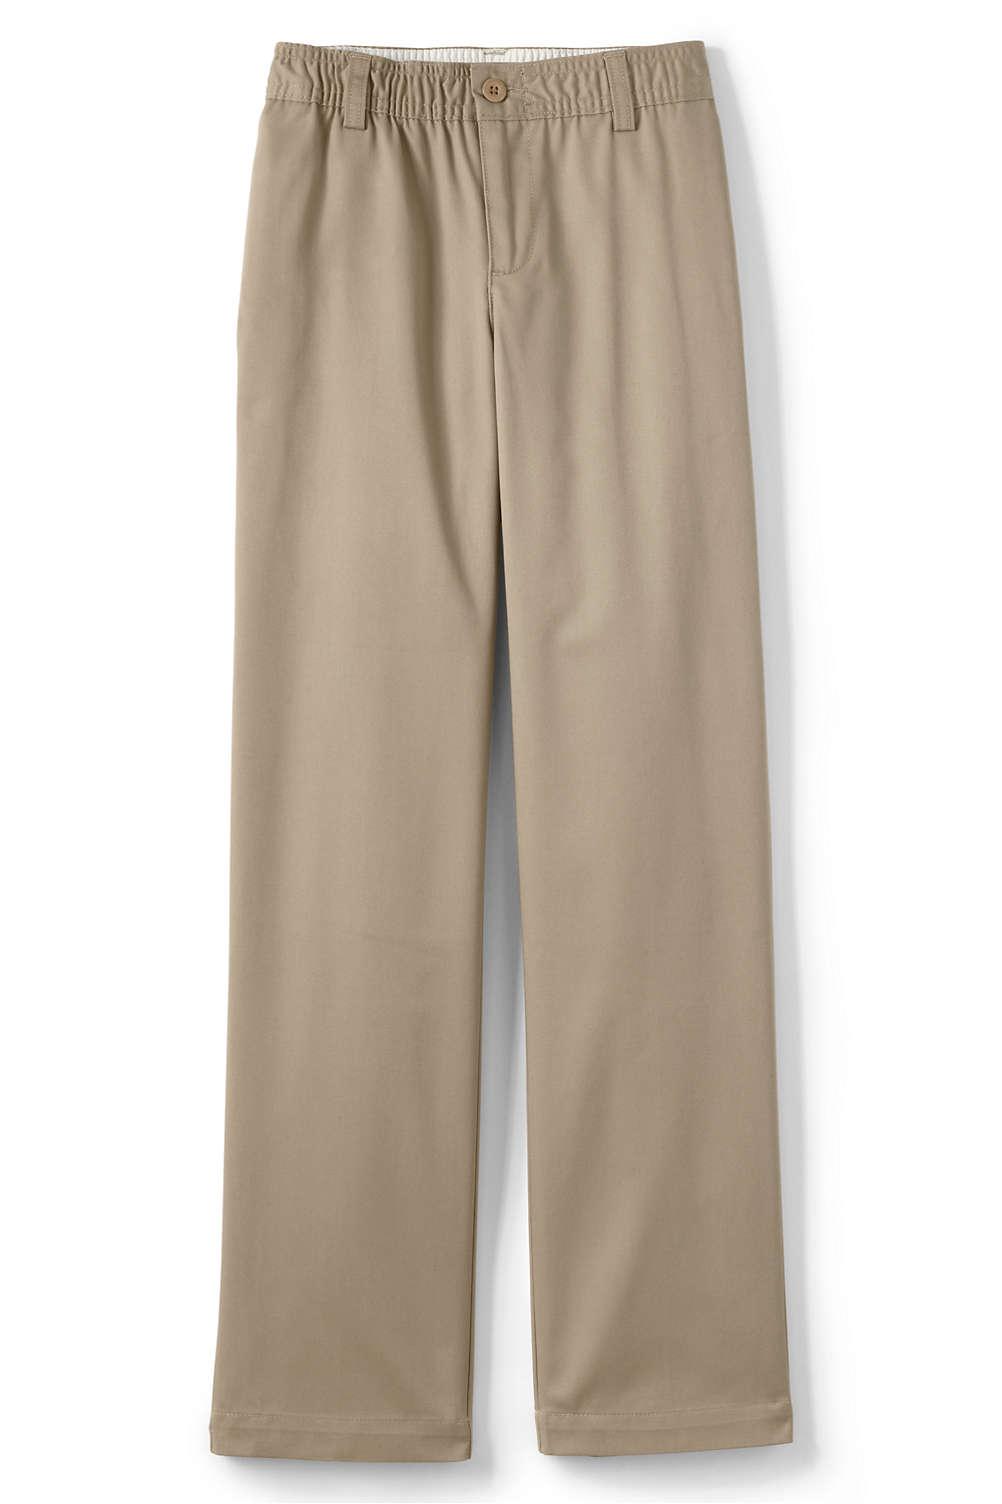 3b07fef1a67 School Uniform Boys Iron Knee Elastic Waist Blend Chino from Lands  End